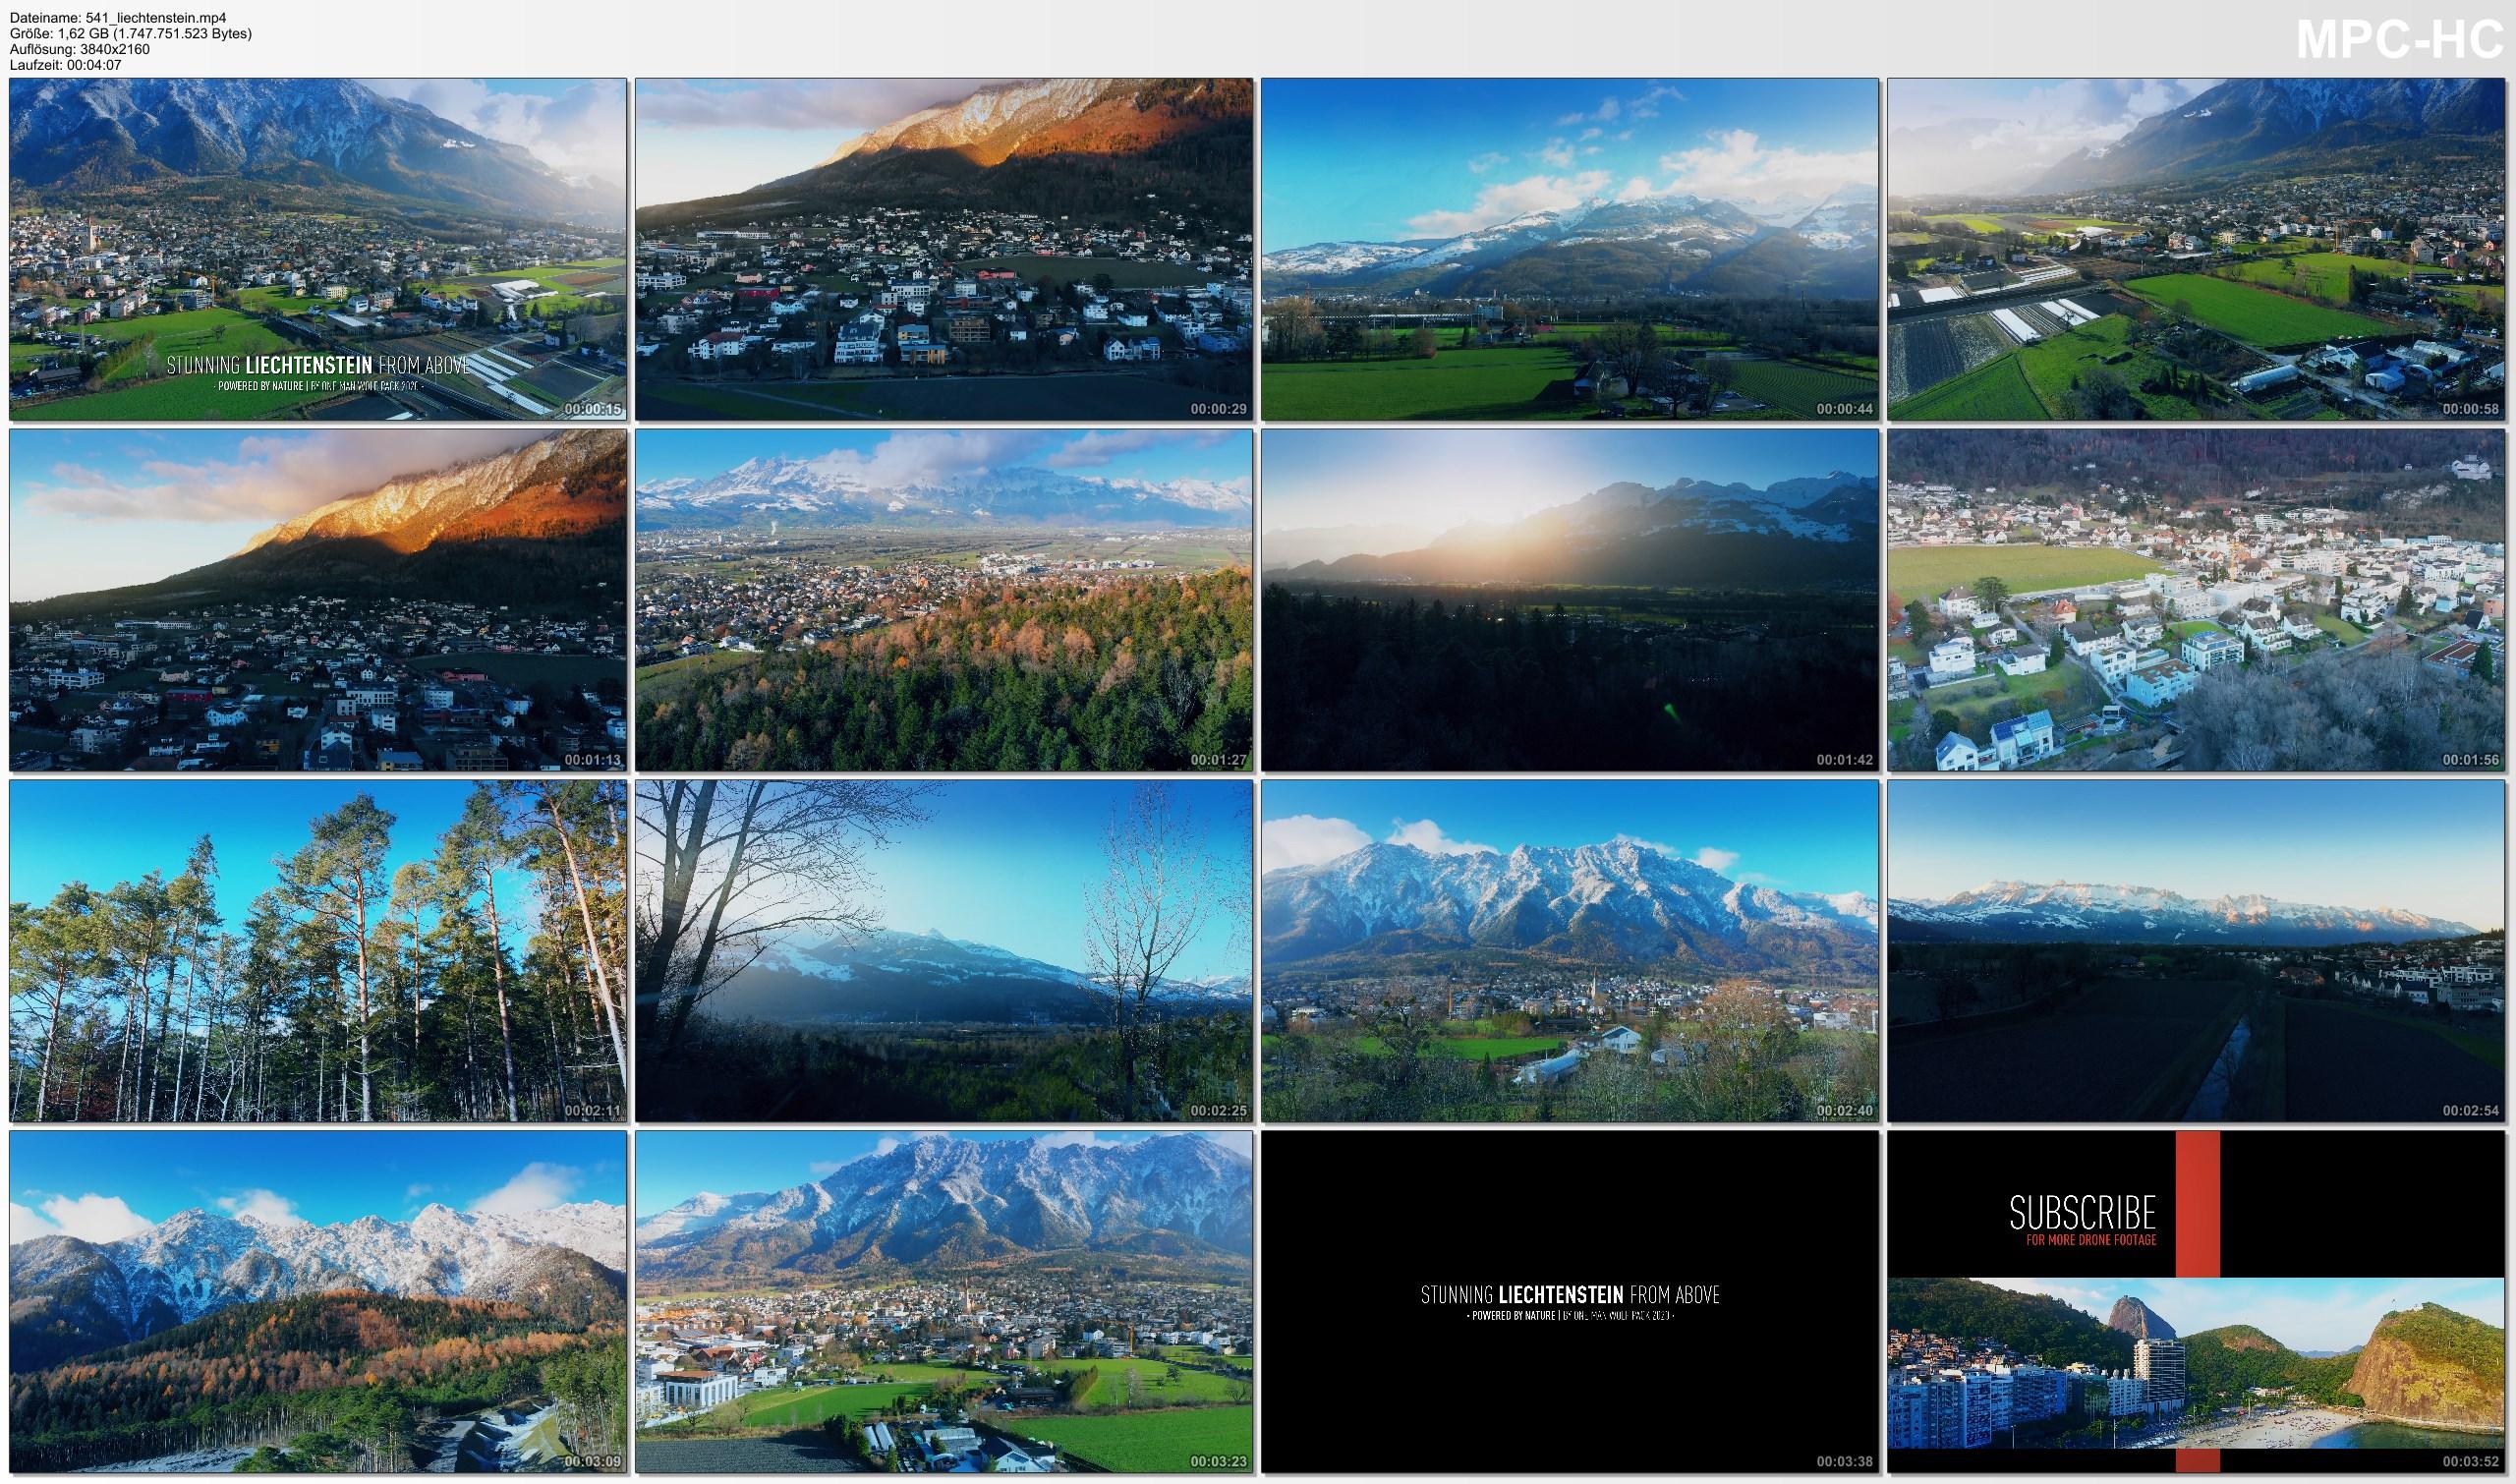 Drone Pictures from Video 【4K】Stunning LIECHTENSTEIN 2020 from Above | Cinematic Wolf Aerial™ Drone Film